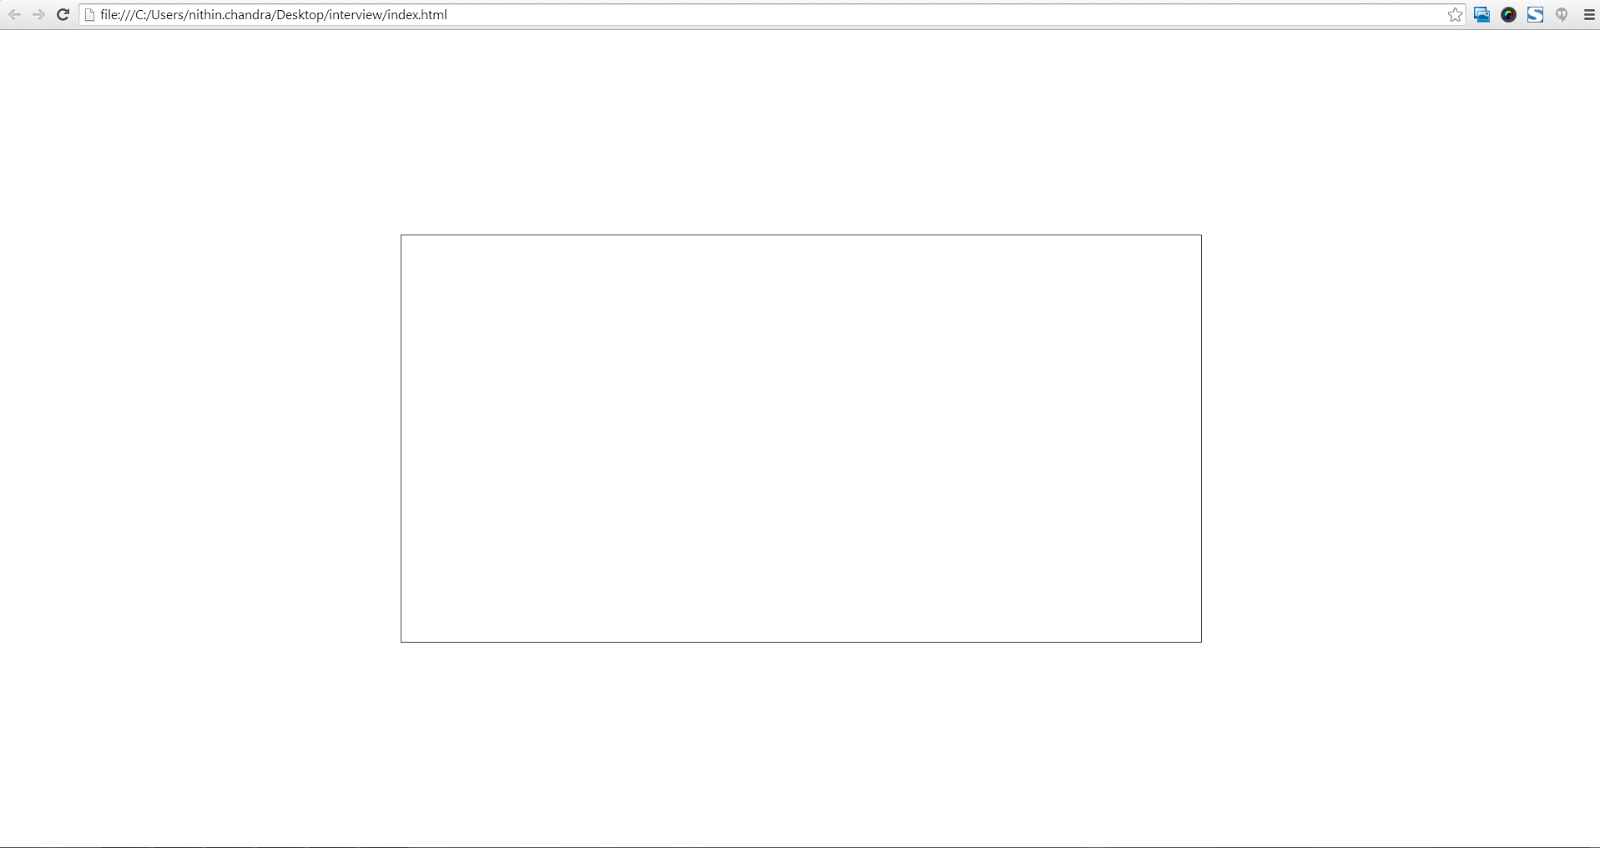 Website Design And Development How To Align Div